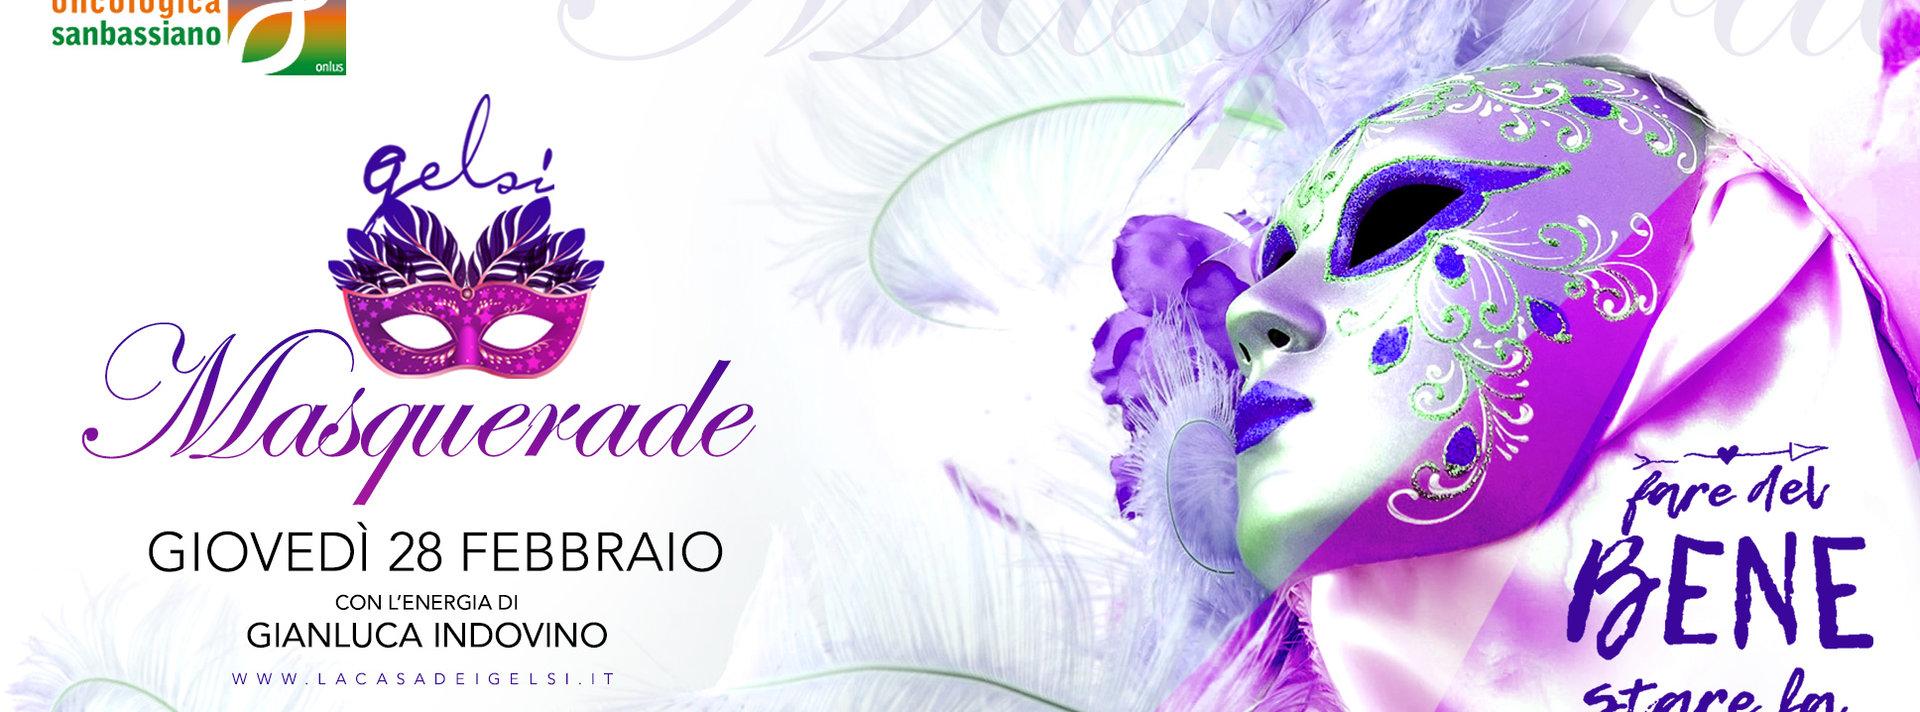 Masquerade - 28 febbraio 2019